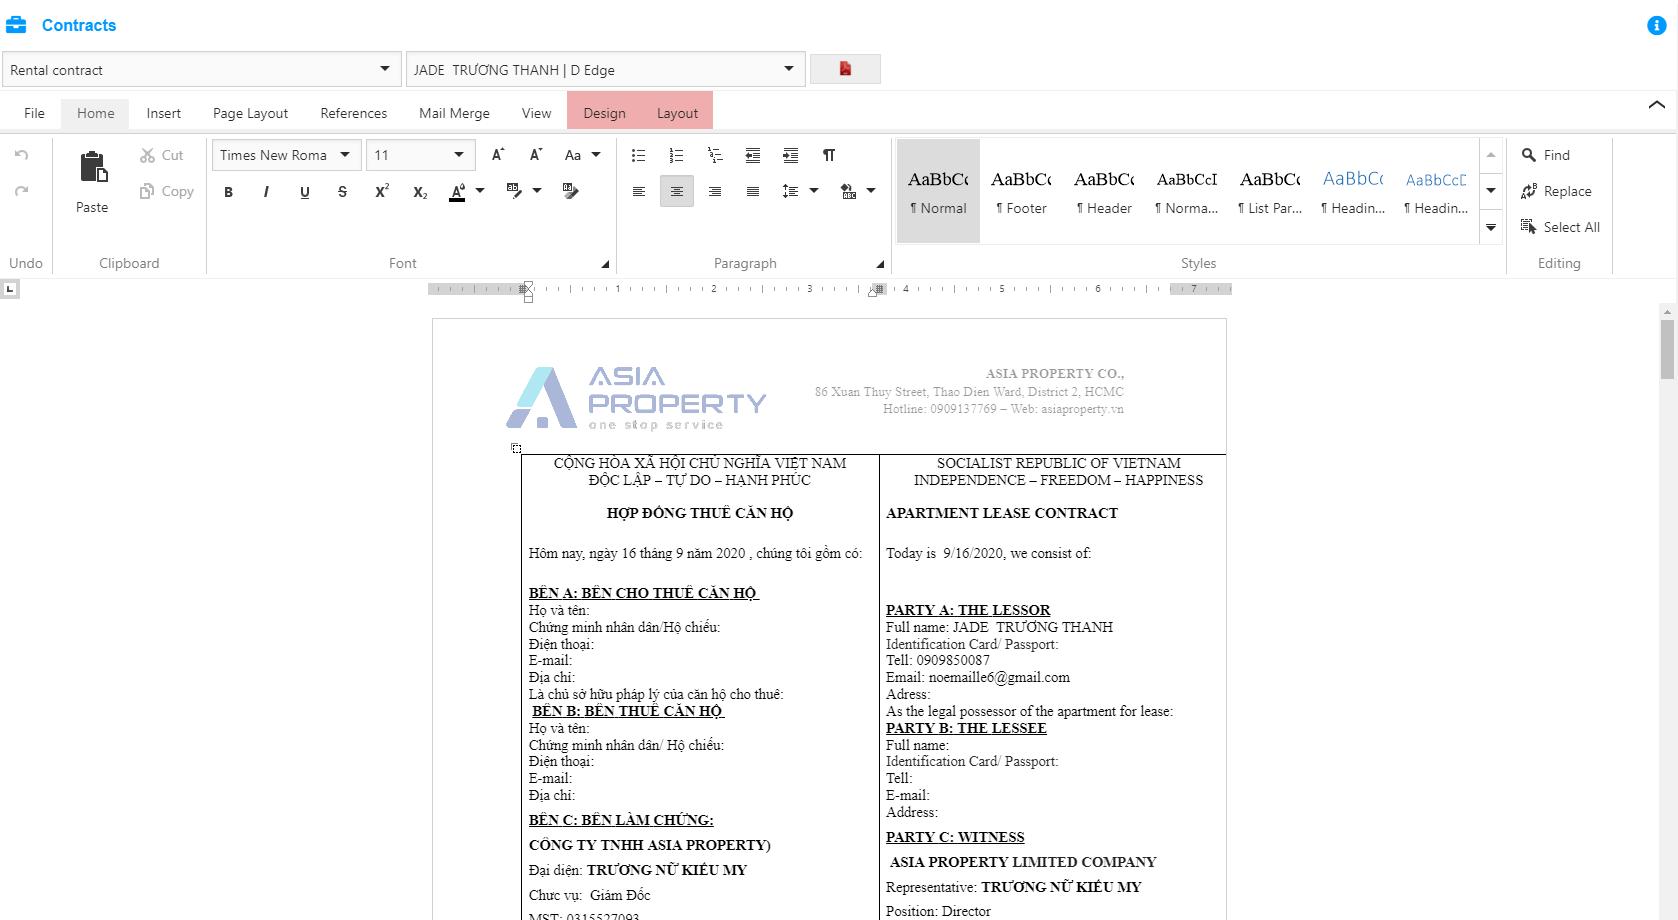 AtemisCloud | 3.Administration | BPO documents merge